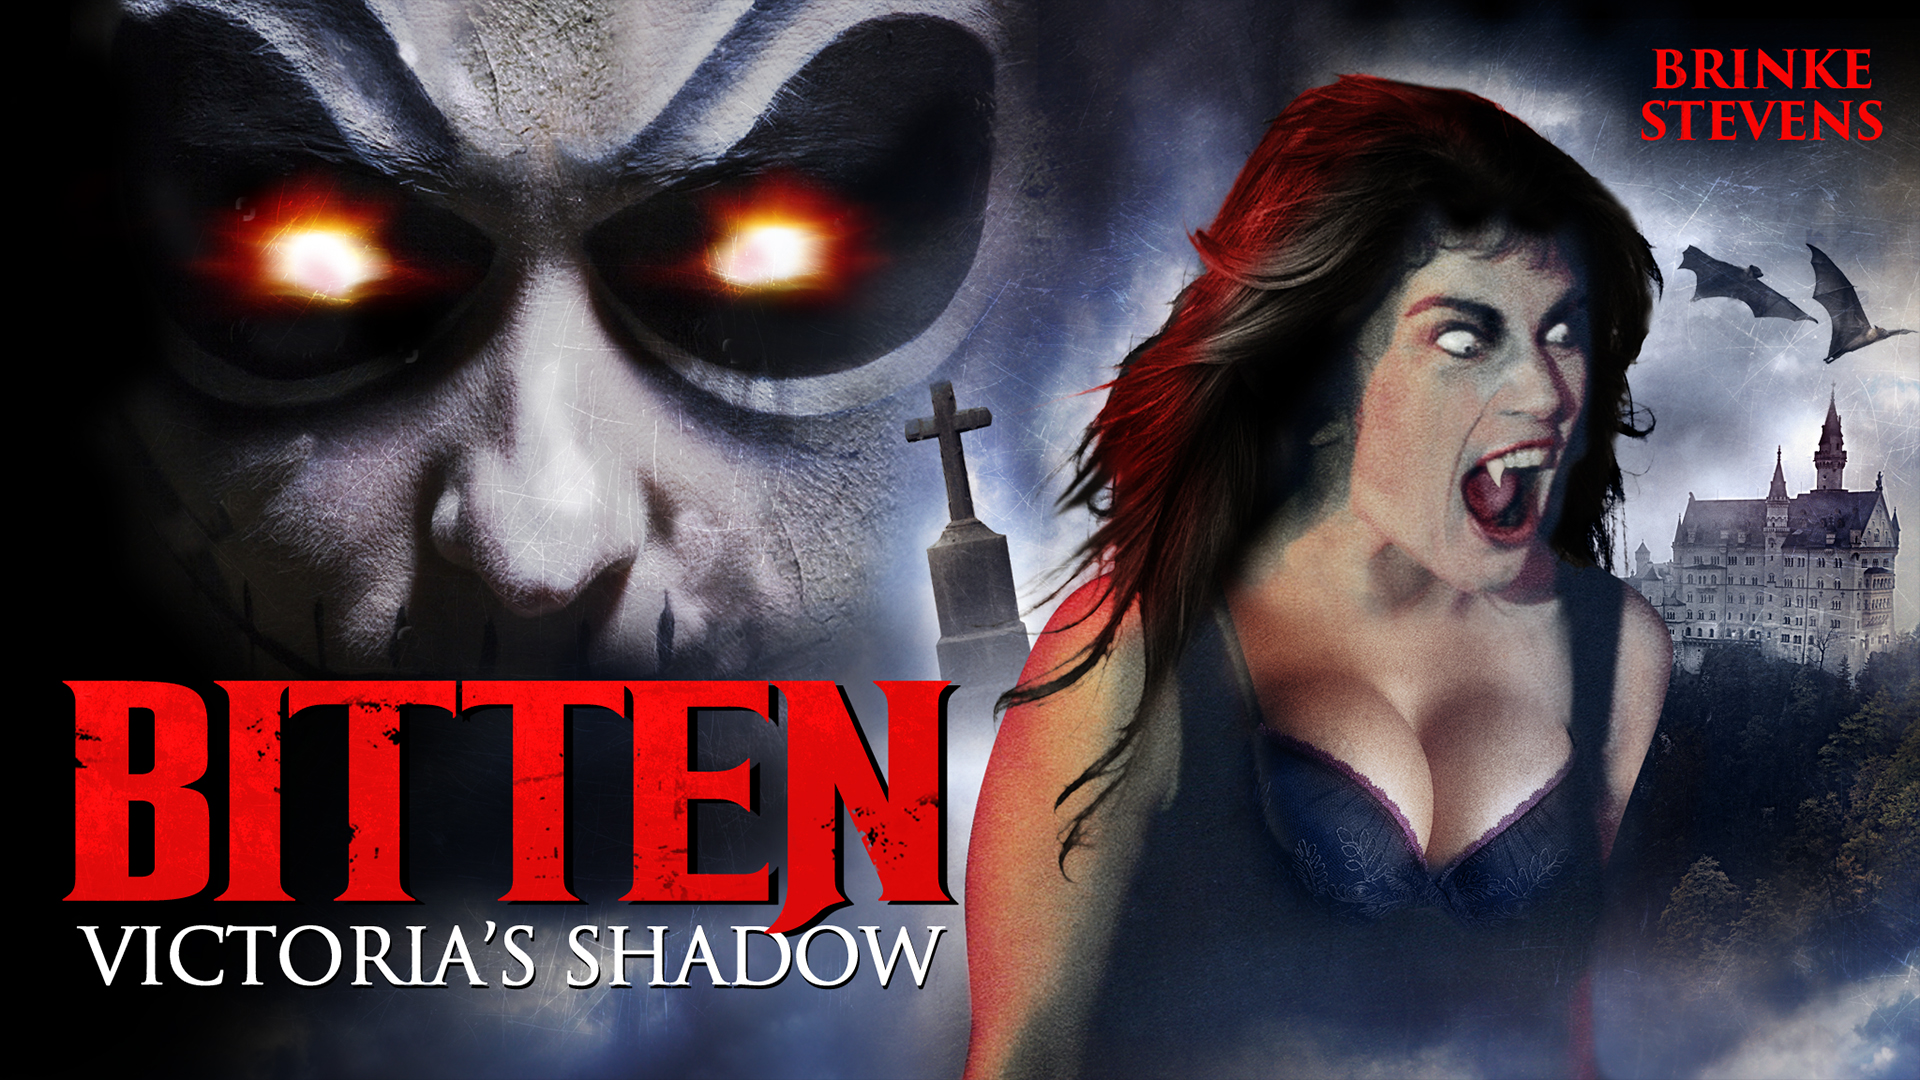 Bitten: Victoria's Shadow